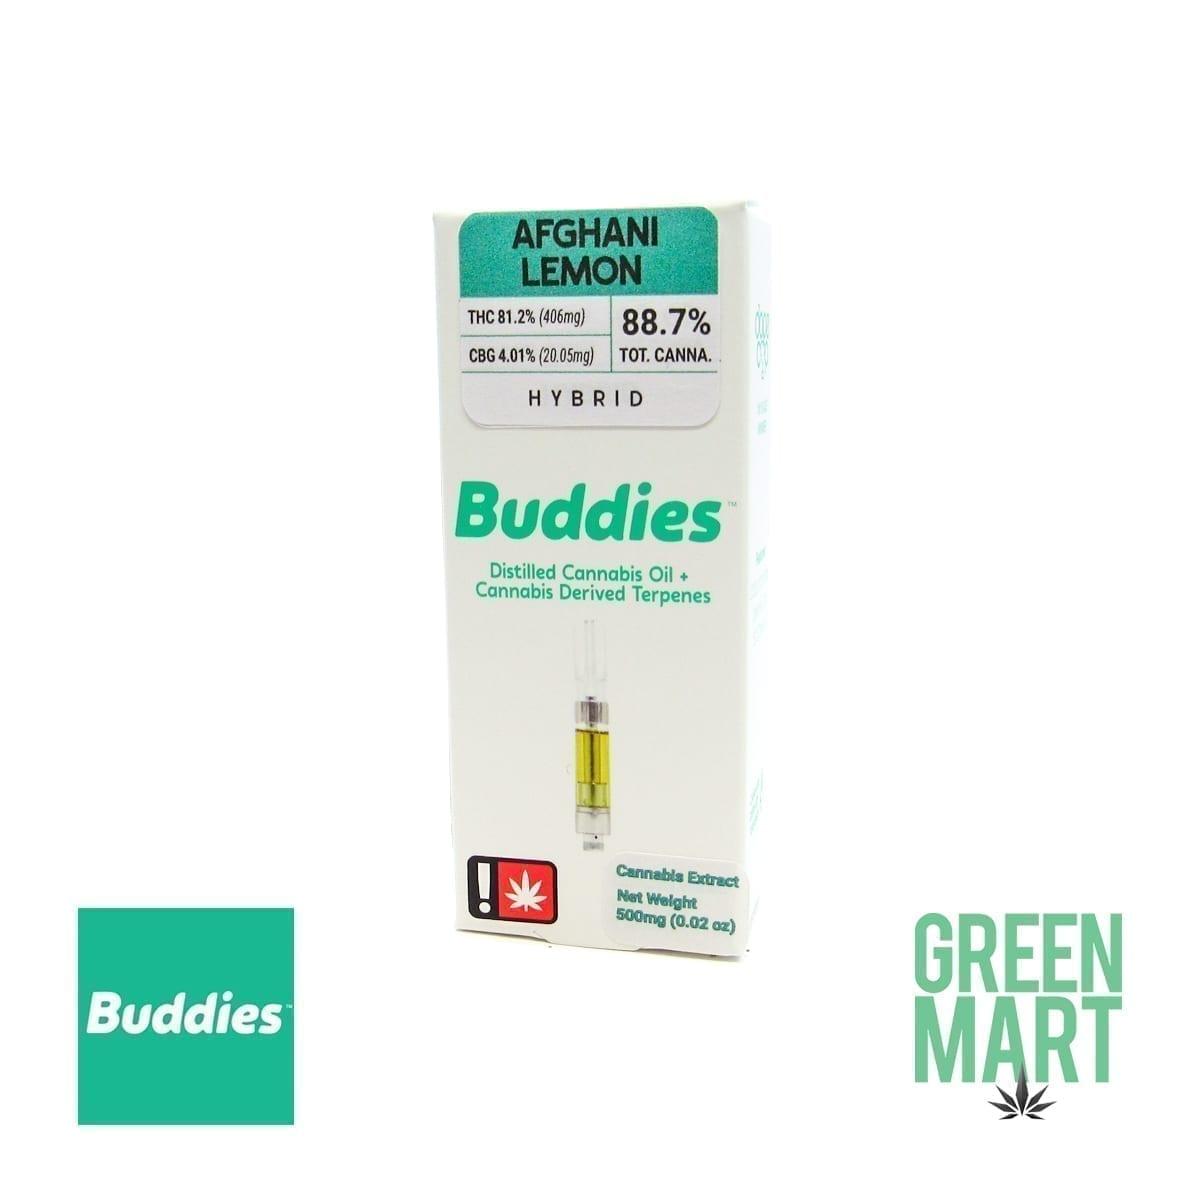 Buddies Brand Distillate Cartridge - Afghani Lemon